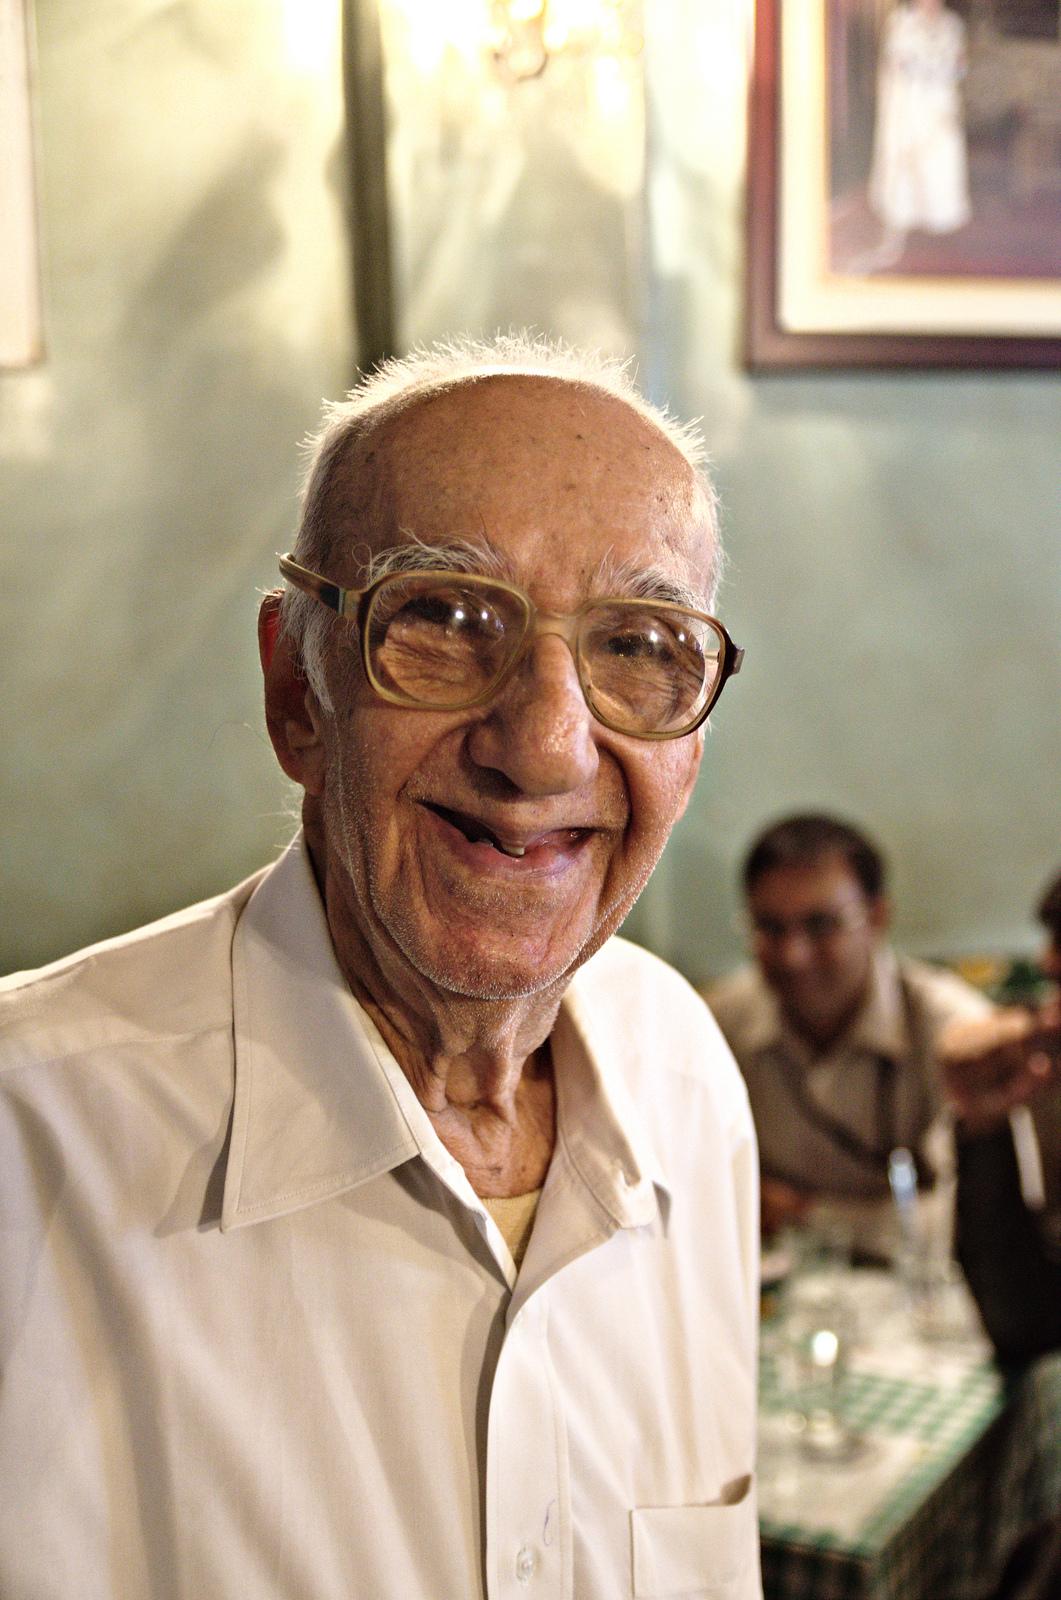 Boman Kohinoor, Owner of the Brittania restaurant in Mumbai, India